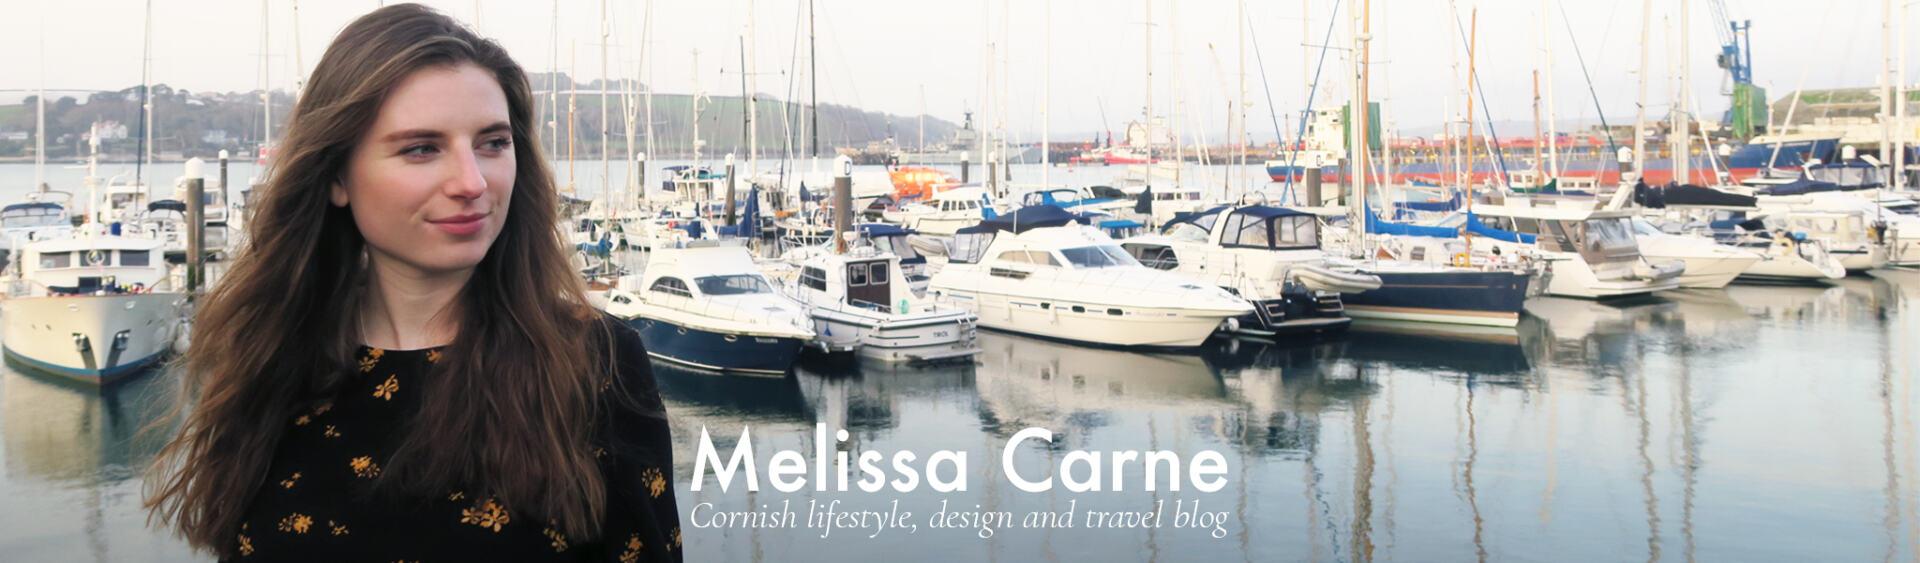 Melissa Carne